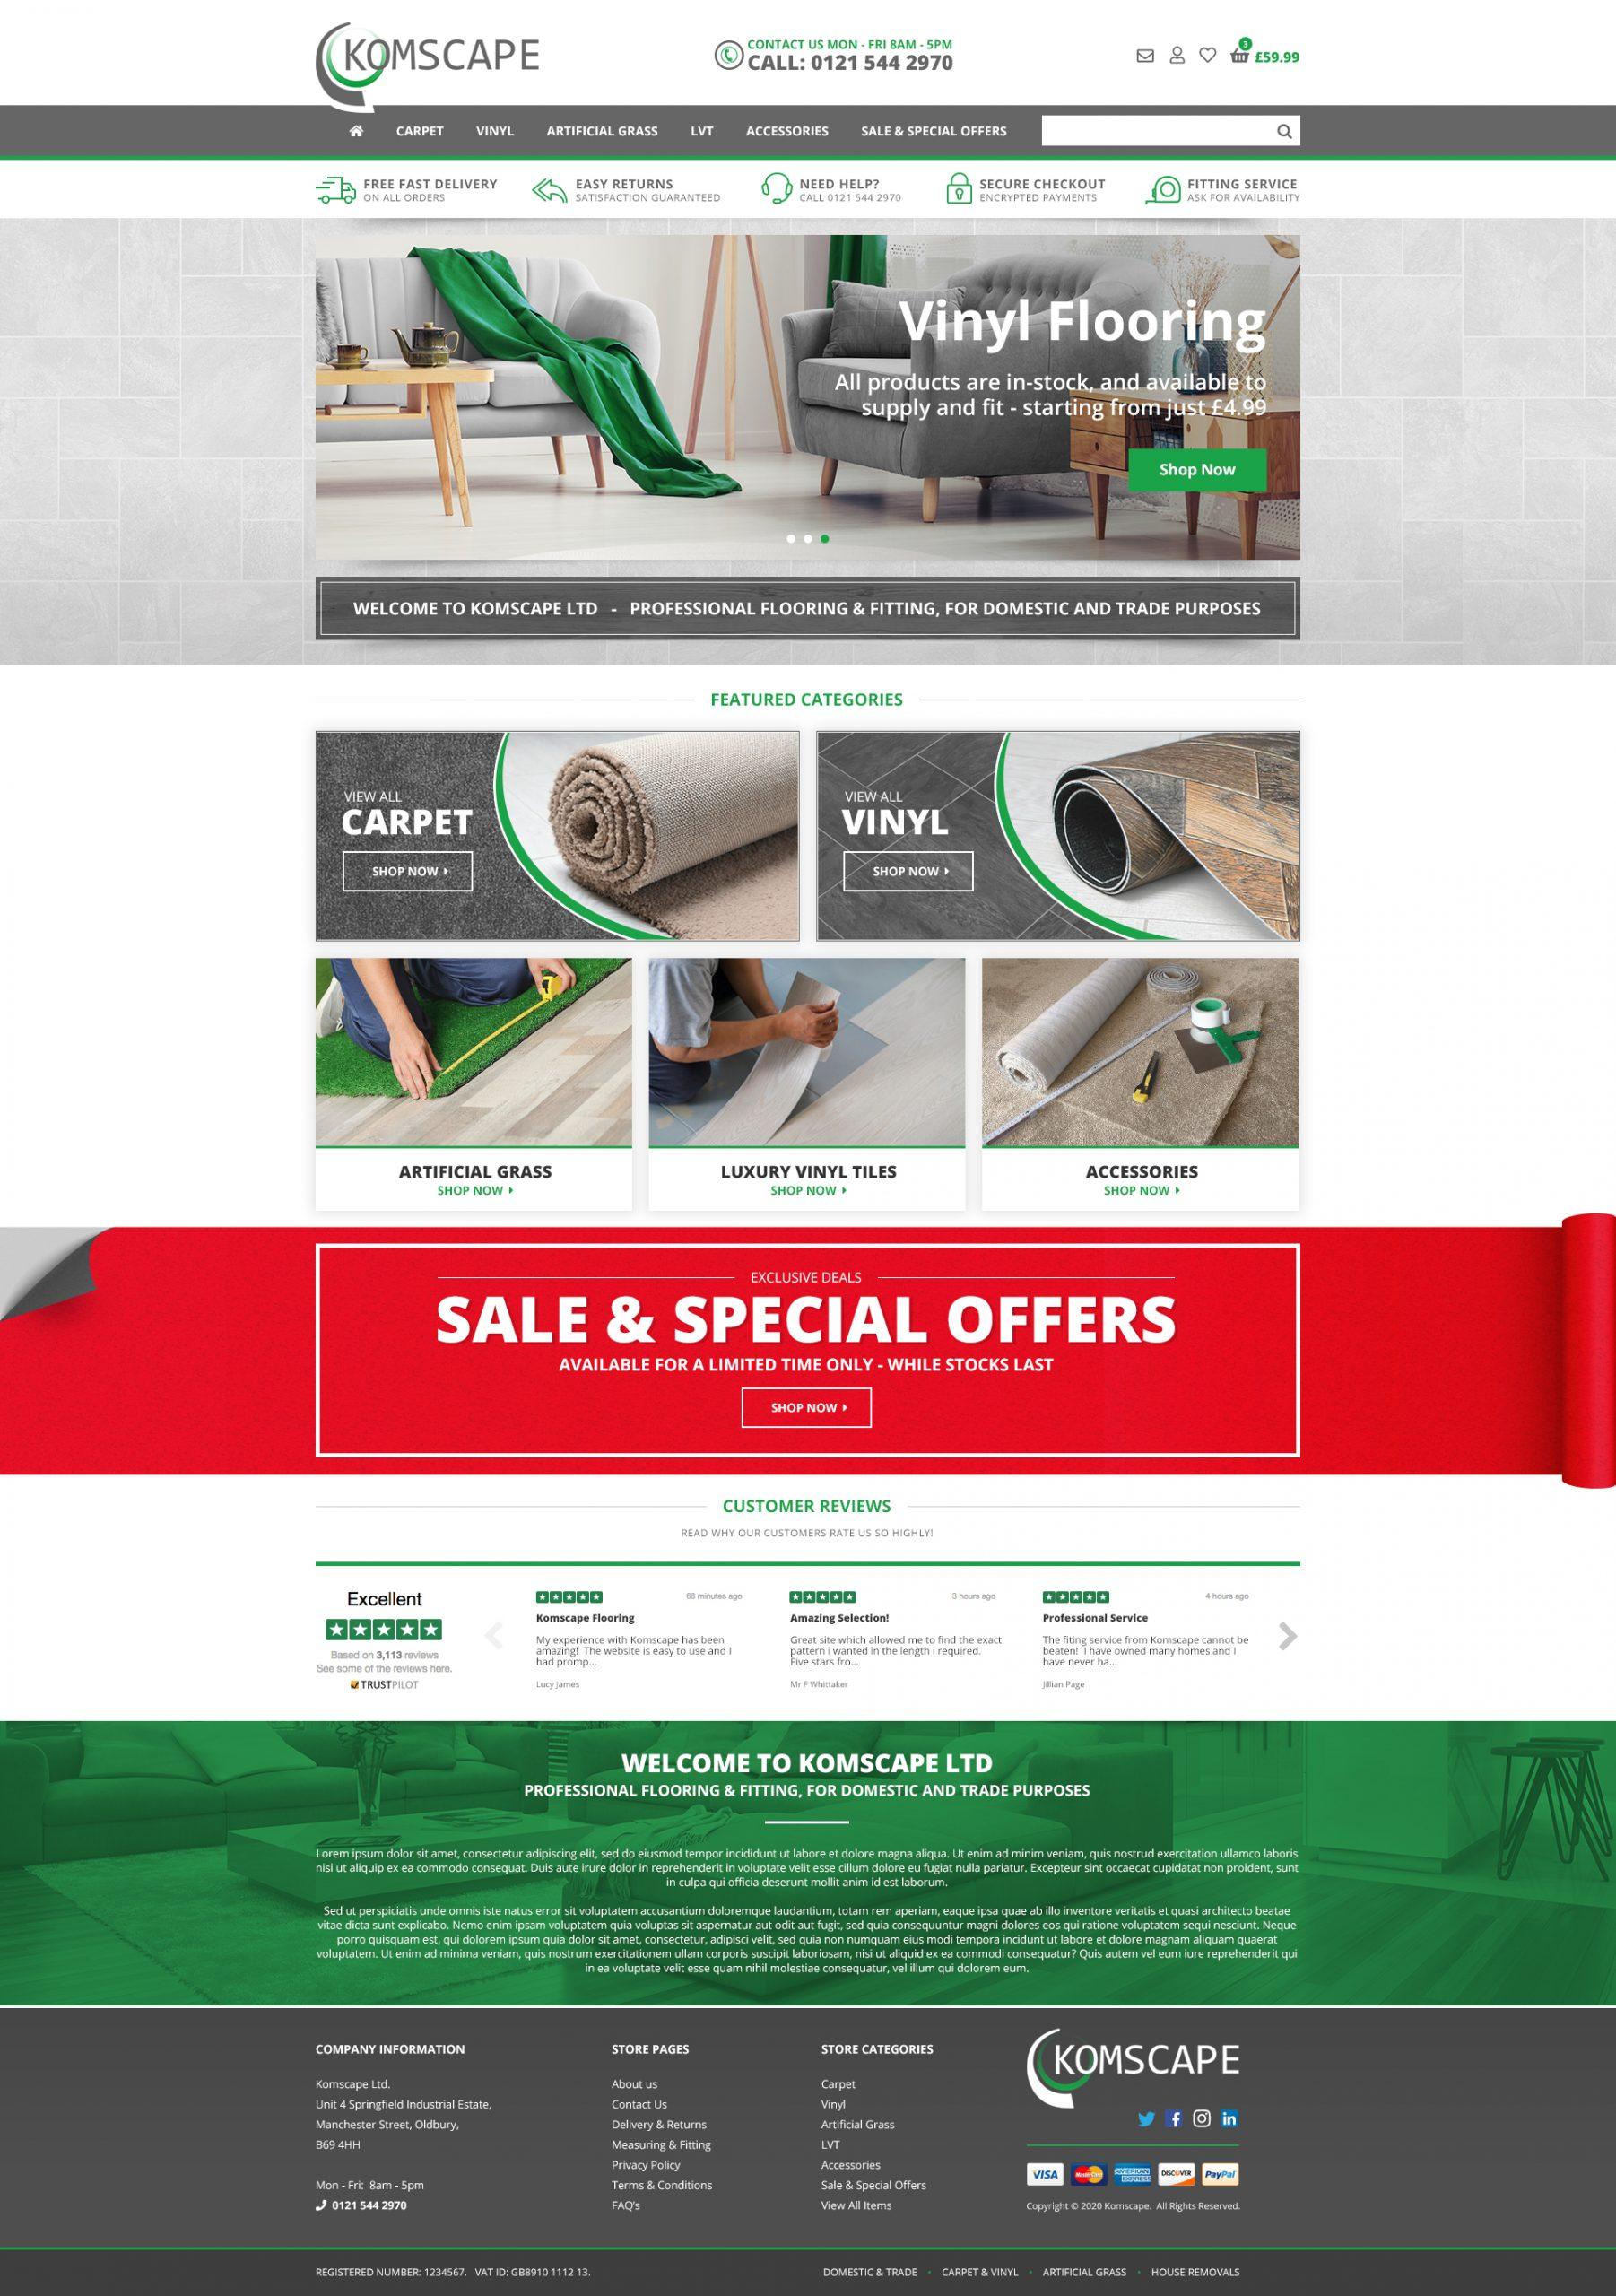 West Midlands based Komscape Flooring - Web Design and Woocommerce Installation including custom product calculators